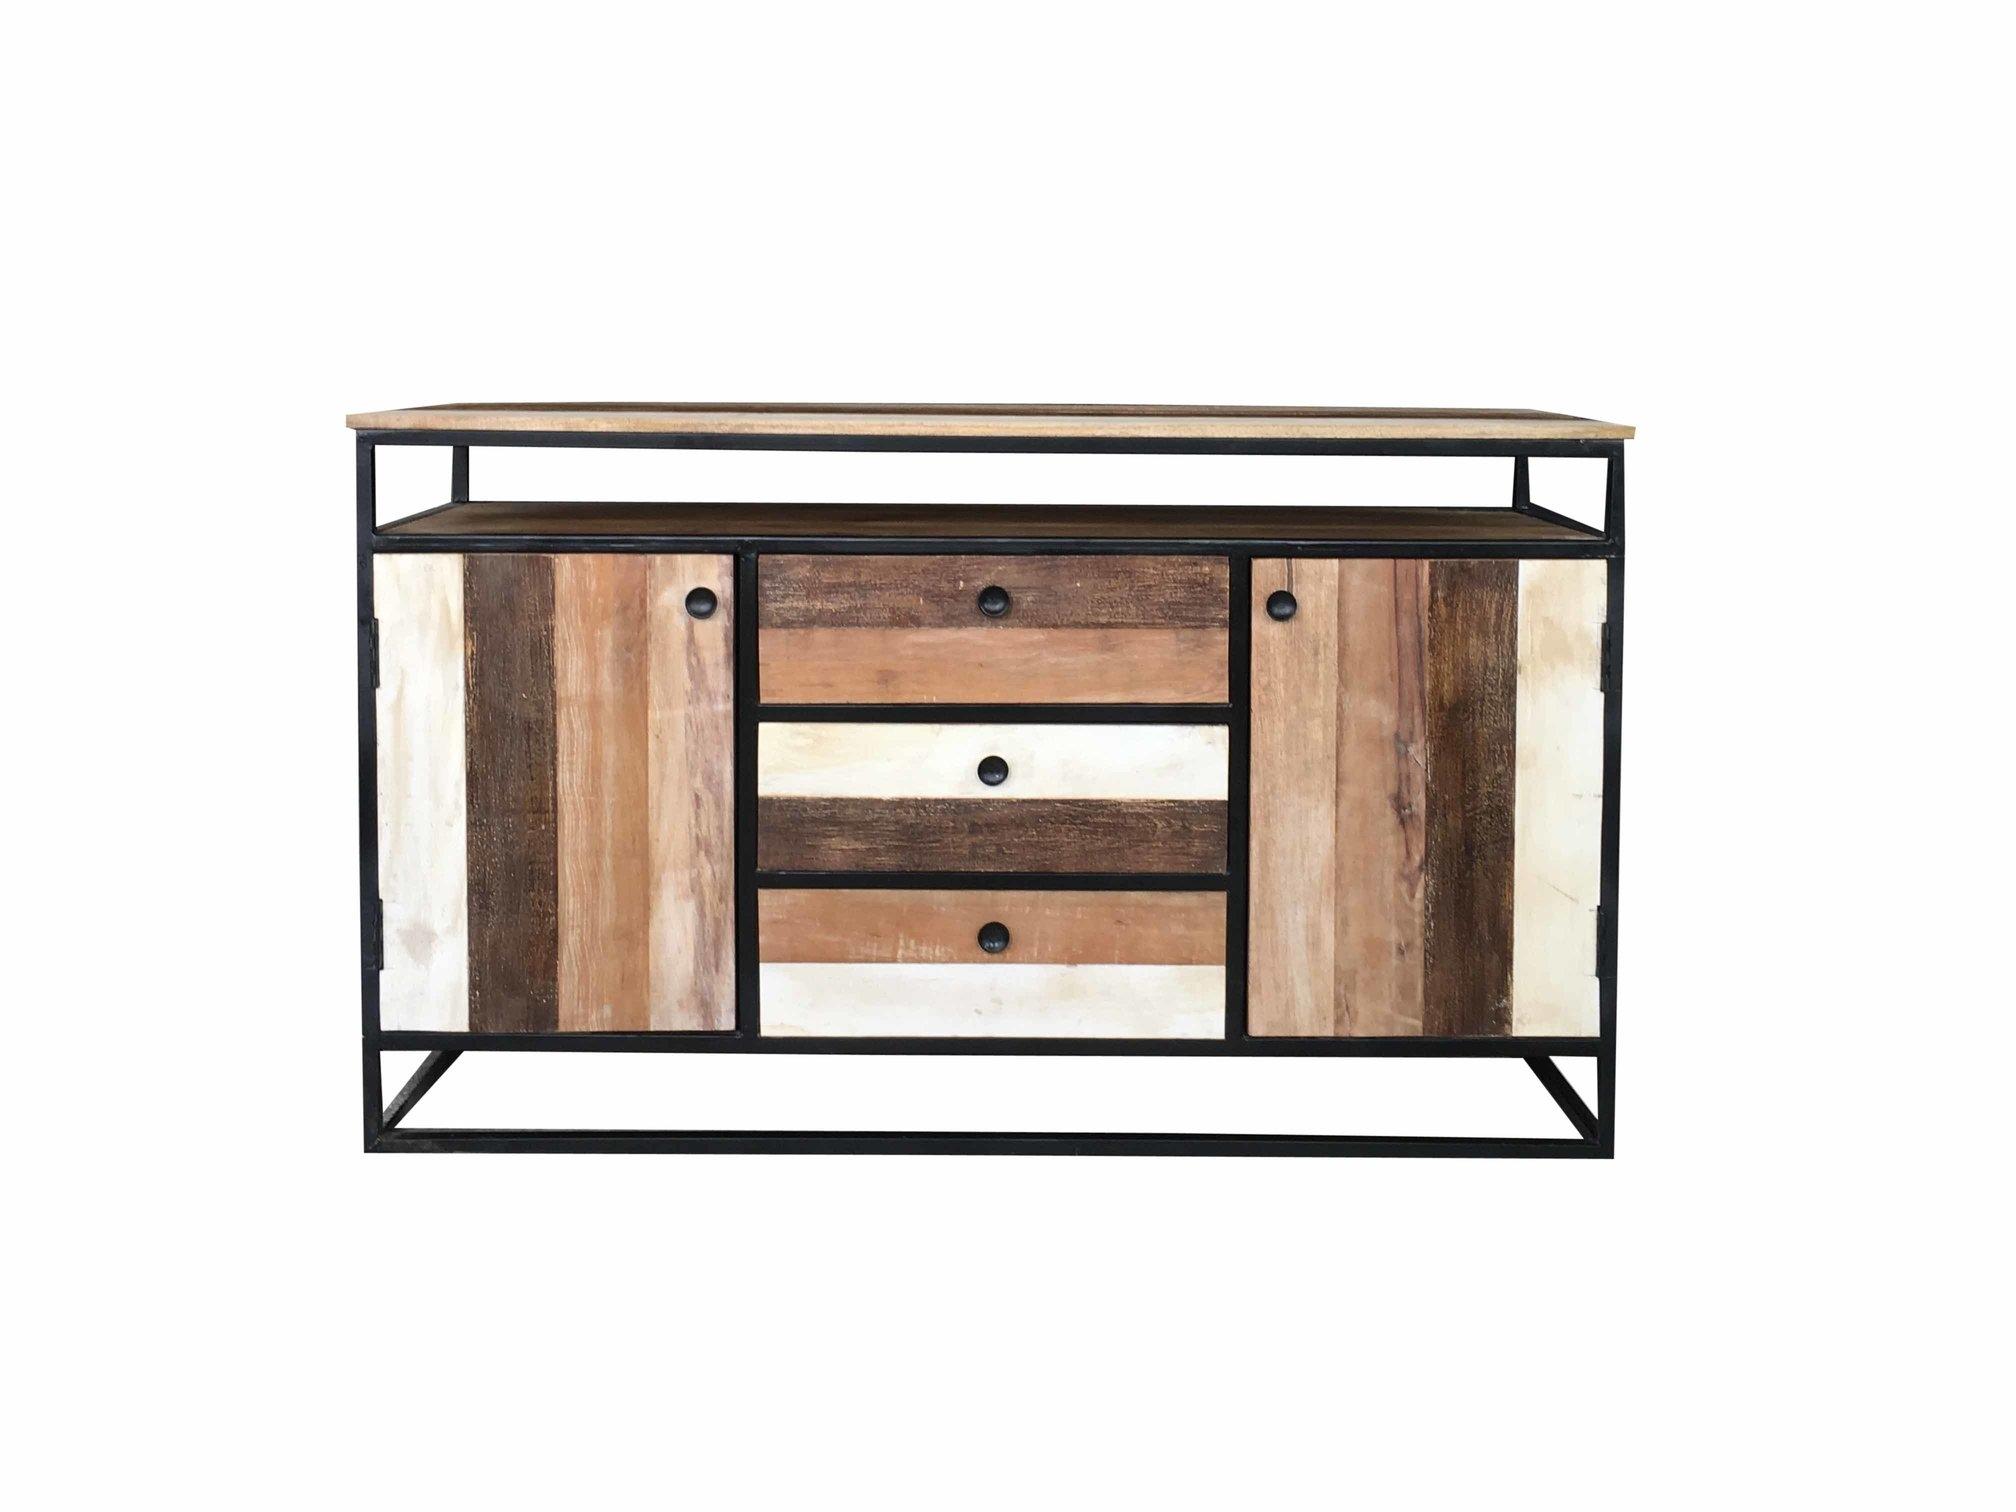 Industrial Reclaimed Mango Wood 2-Door 3-Drawer Sideboard With Metal intended for Metal Framed Reclaimed Wood Sideboards (Image 12 of 30)